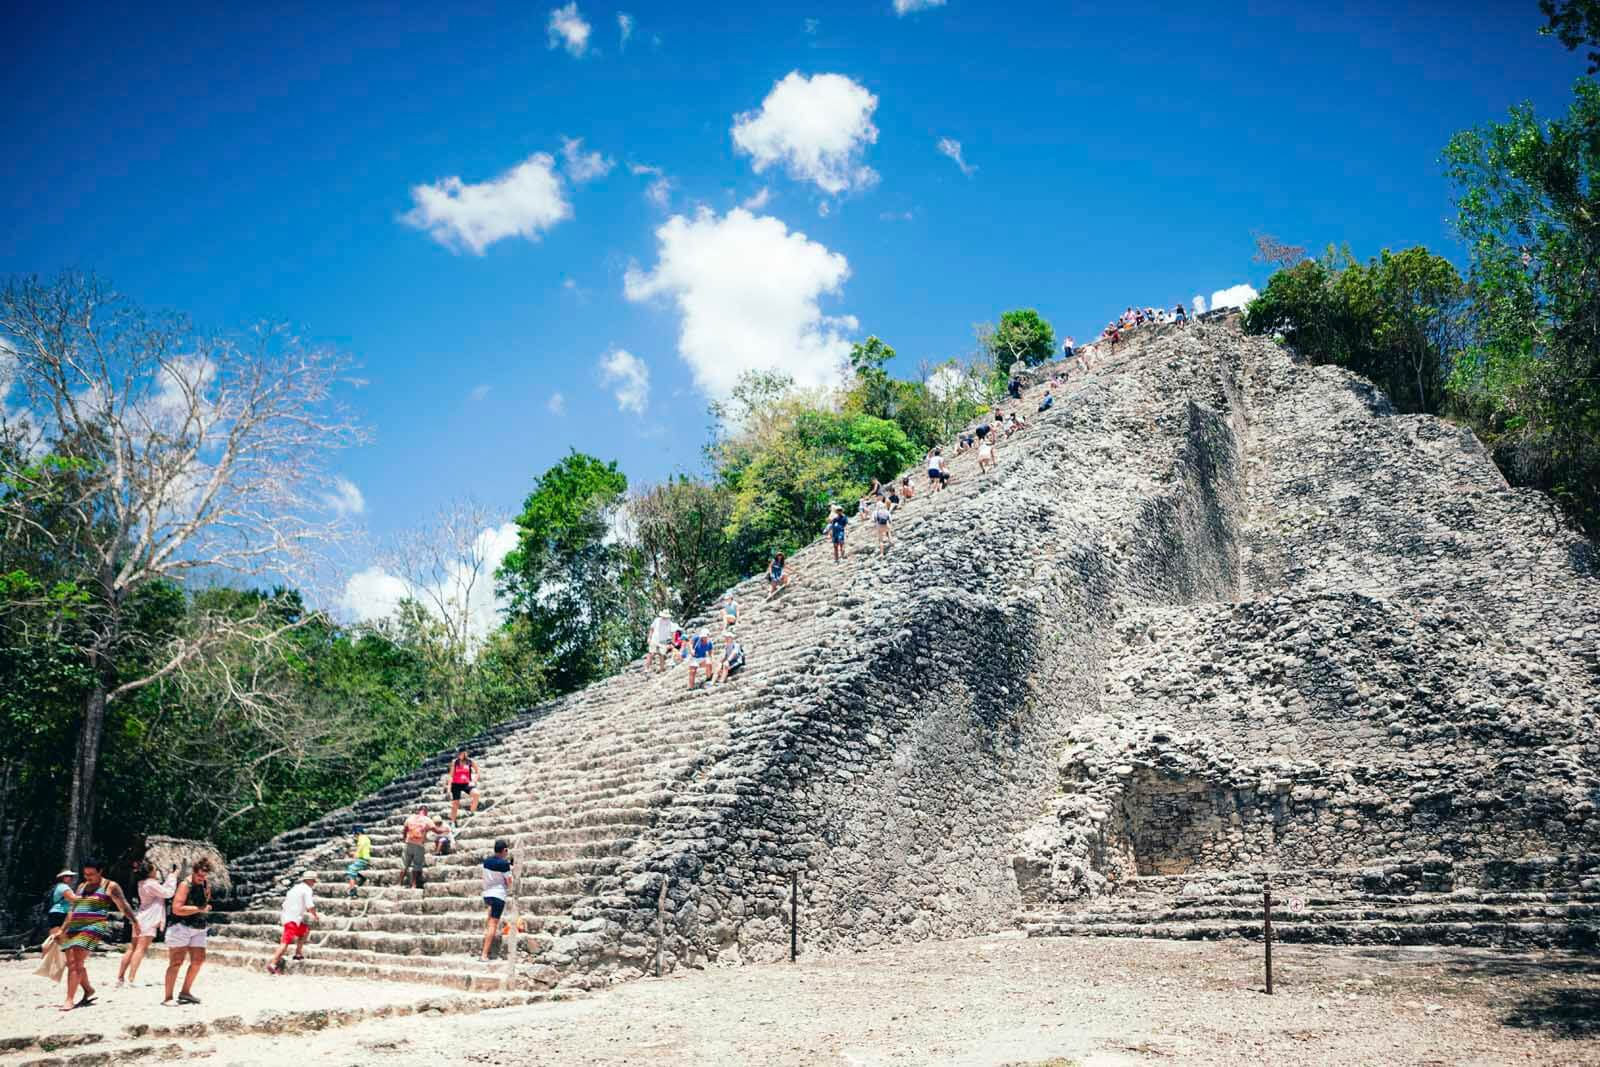 People climbing Coba Ruins